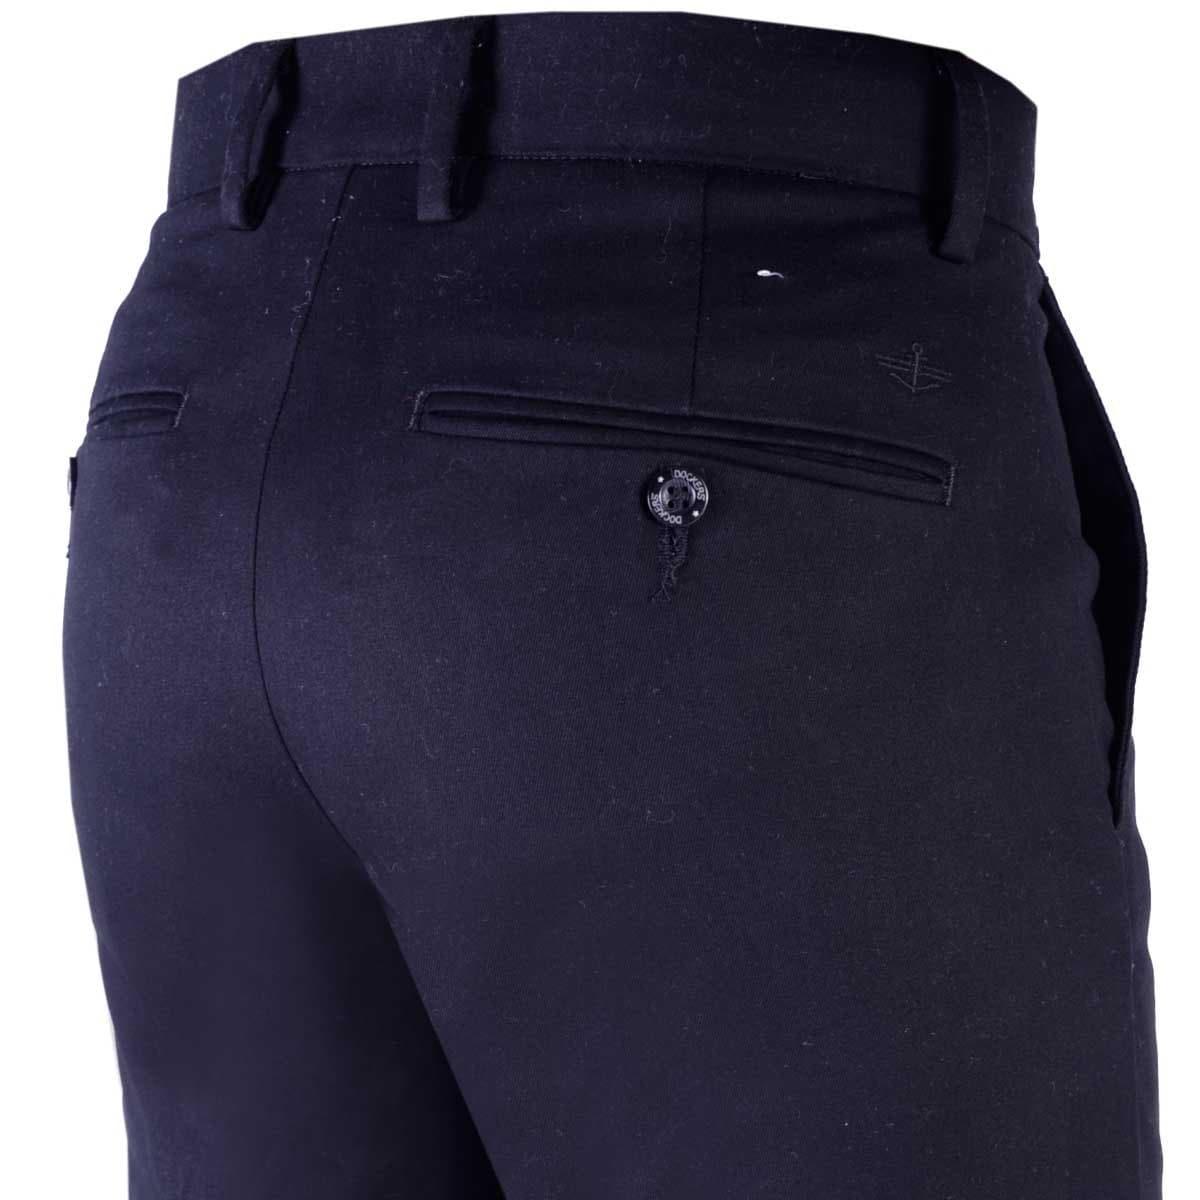 Pantalon Slim Fit Dockers